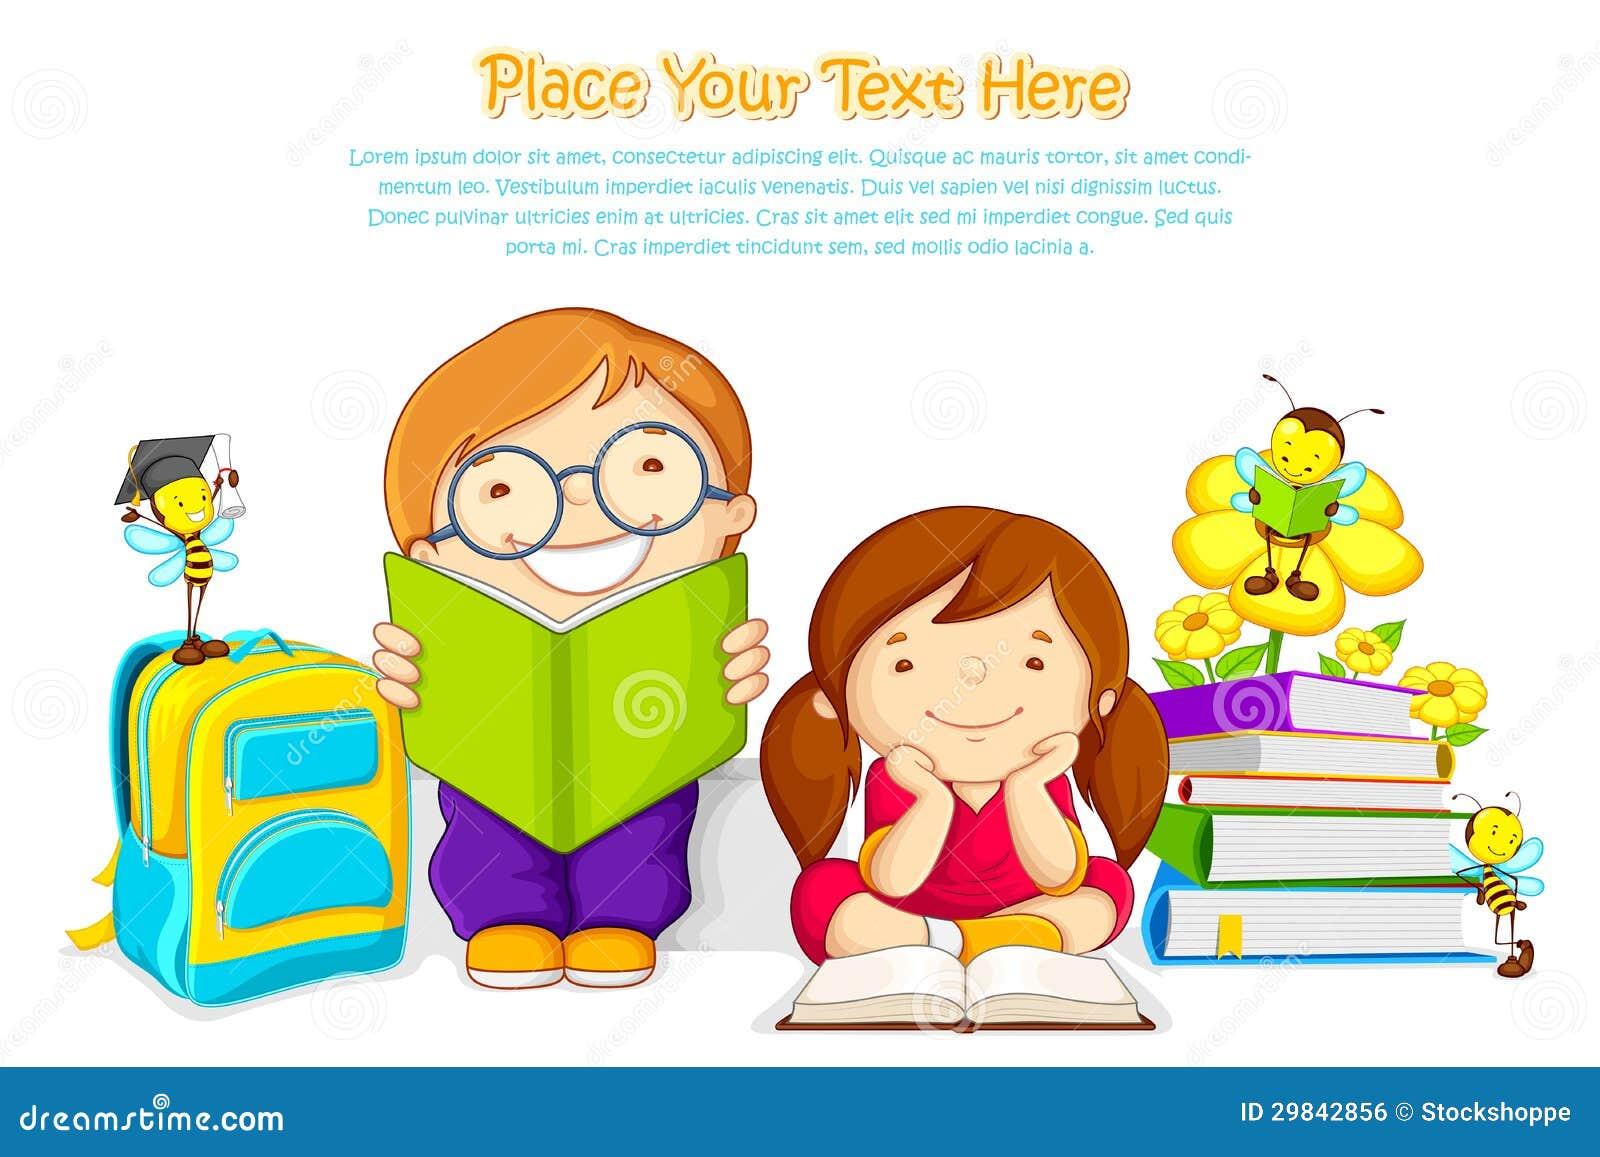 kids studying royalty free stock image image 29842856 Free Clip Art Art Sclupt Art Free Clip Art